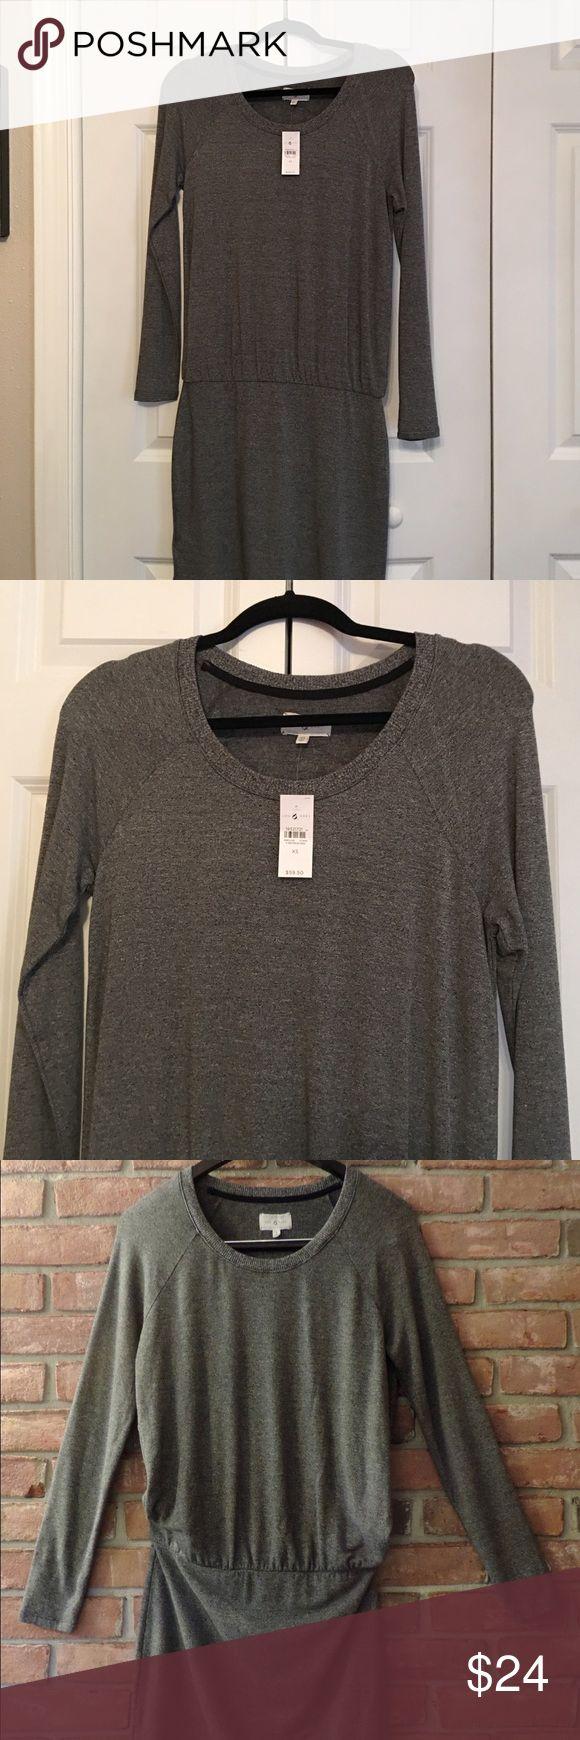 Lou & Grey long sleeved dress Lou & Grey long sleeved Grey dress. Round neck. Fits tight below the waist. Elastic waist. Lou & Grey Dresses Mini